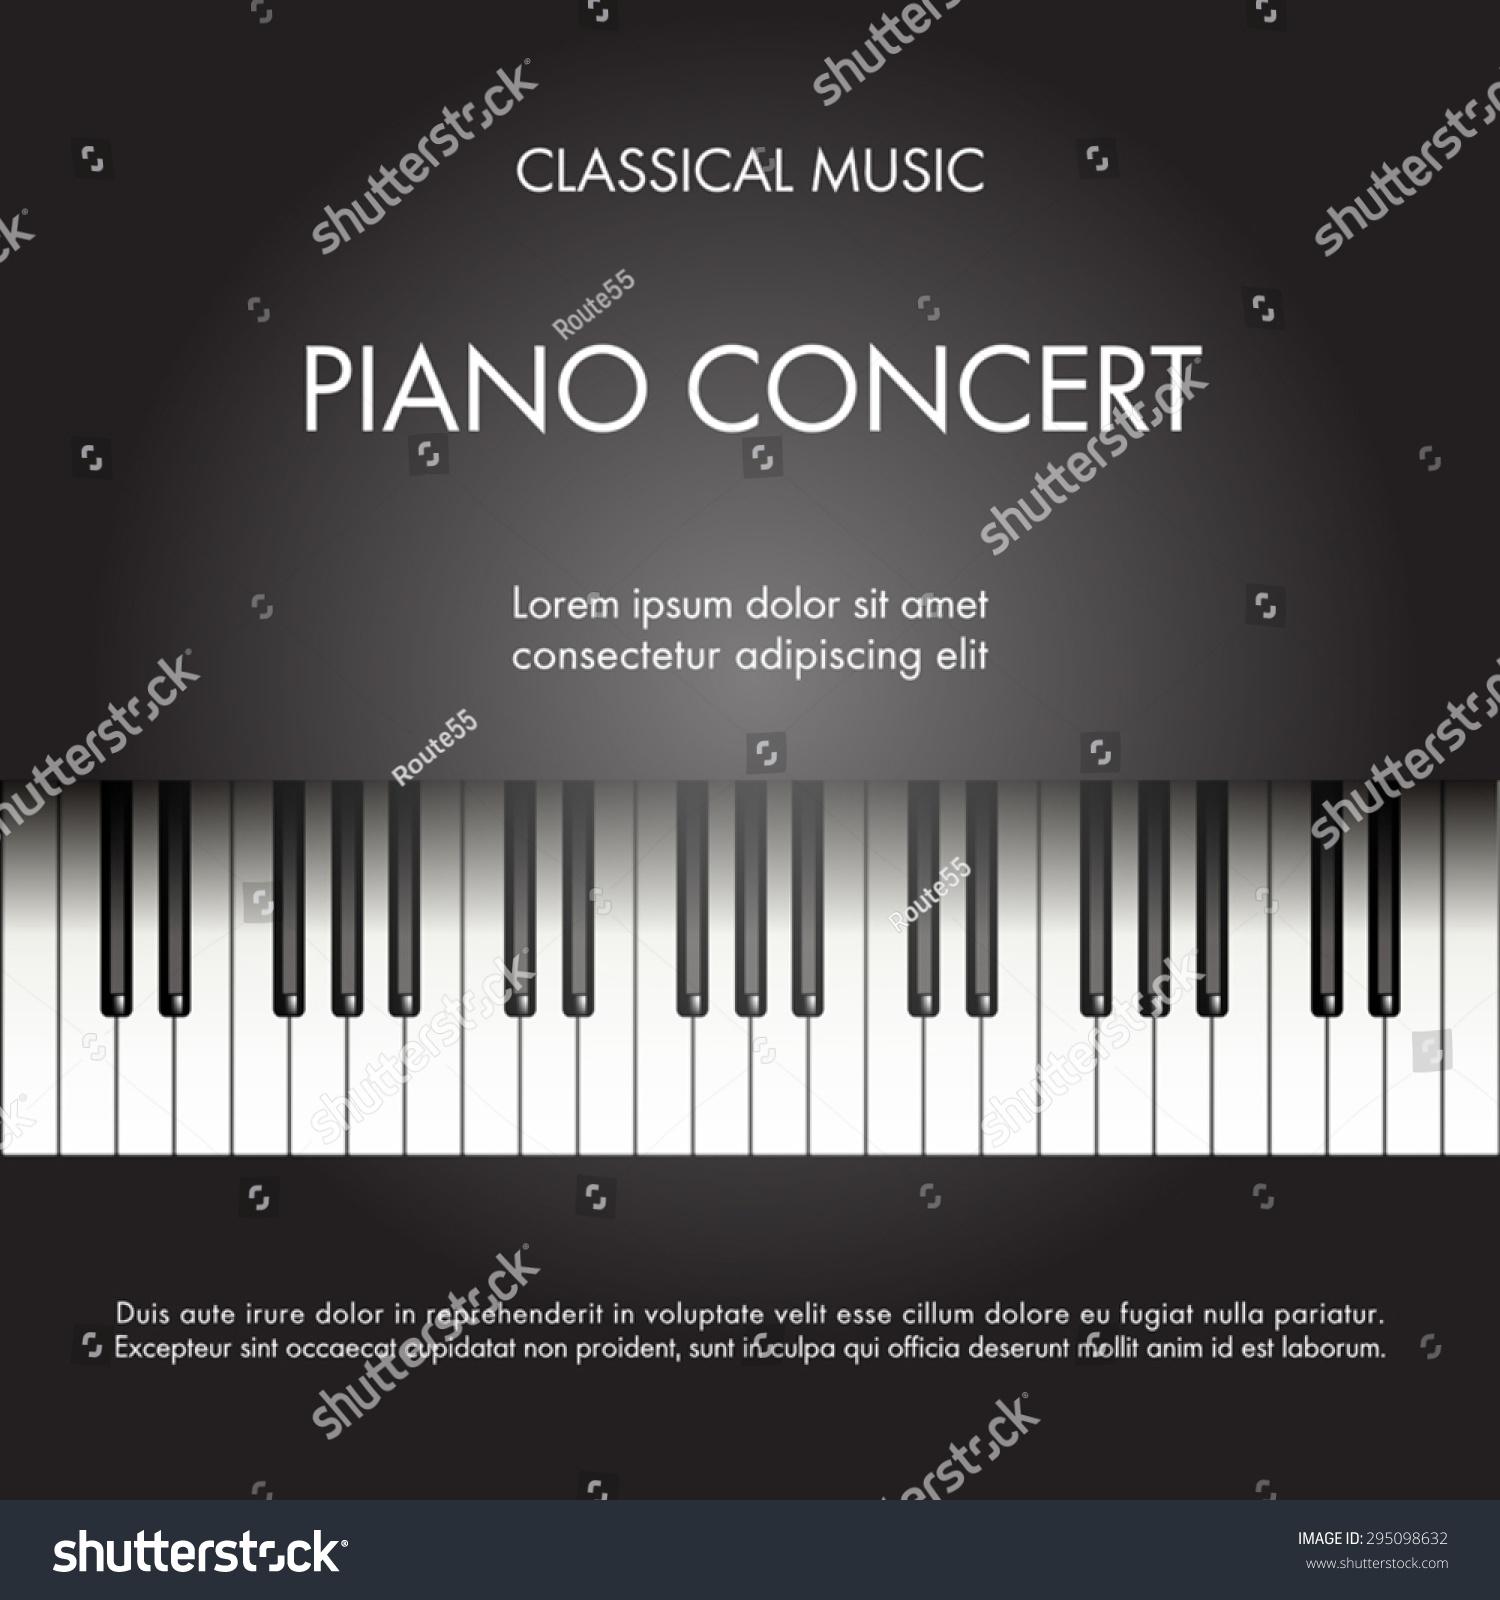 Piano Recital Invitation Template is Amazing Sample To Make Cool Invitation Card